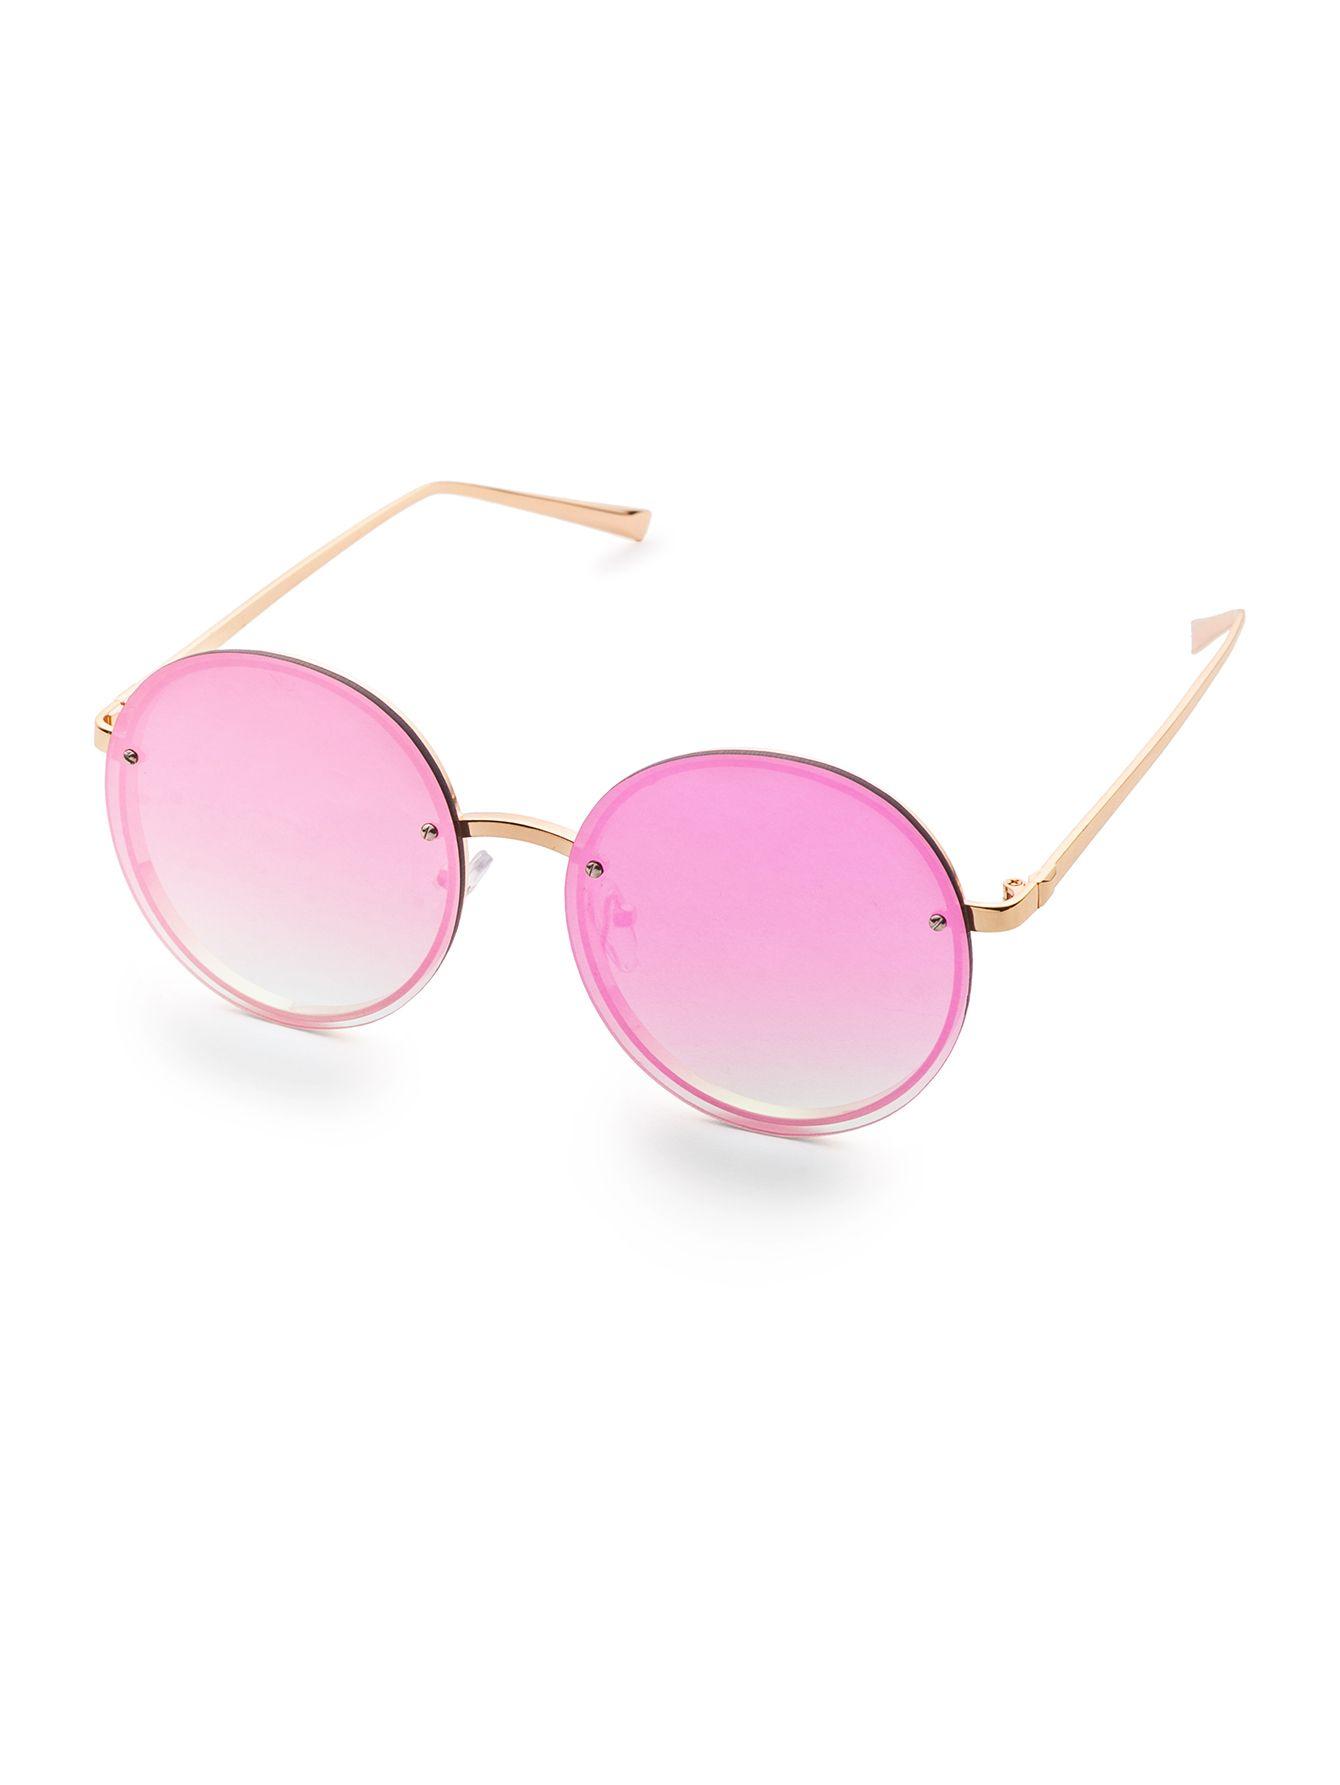 8a5bcb41d9 Gafas de sol con marco dorado y lentes redondos violeta-Spanish  SheIn(Sheinside)